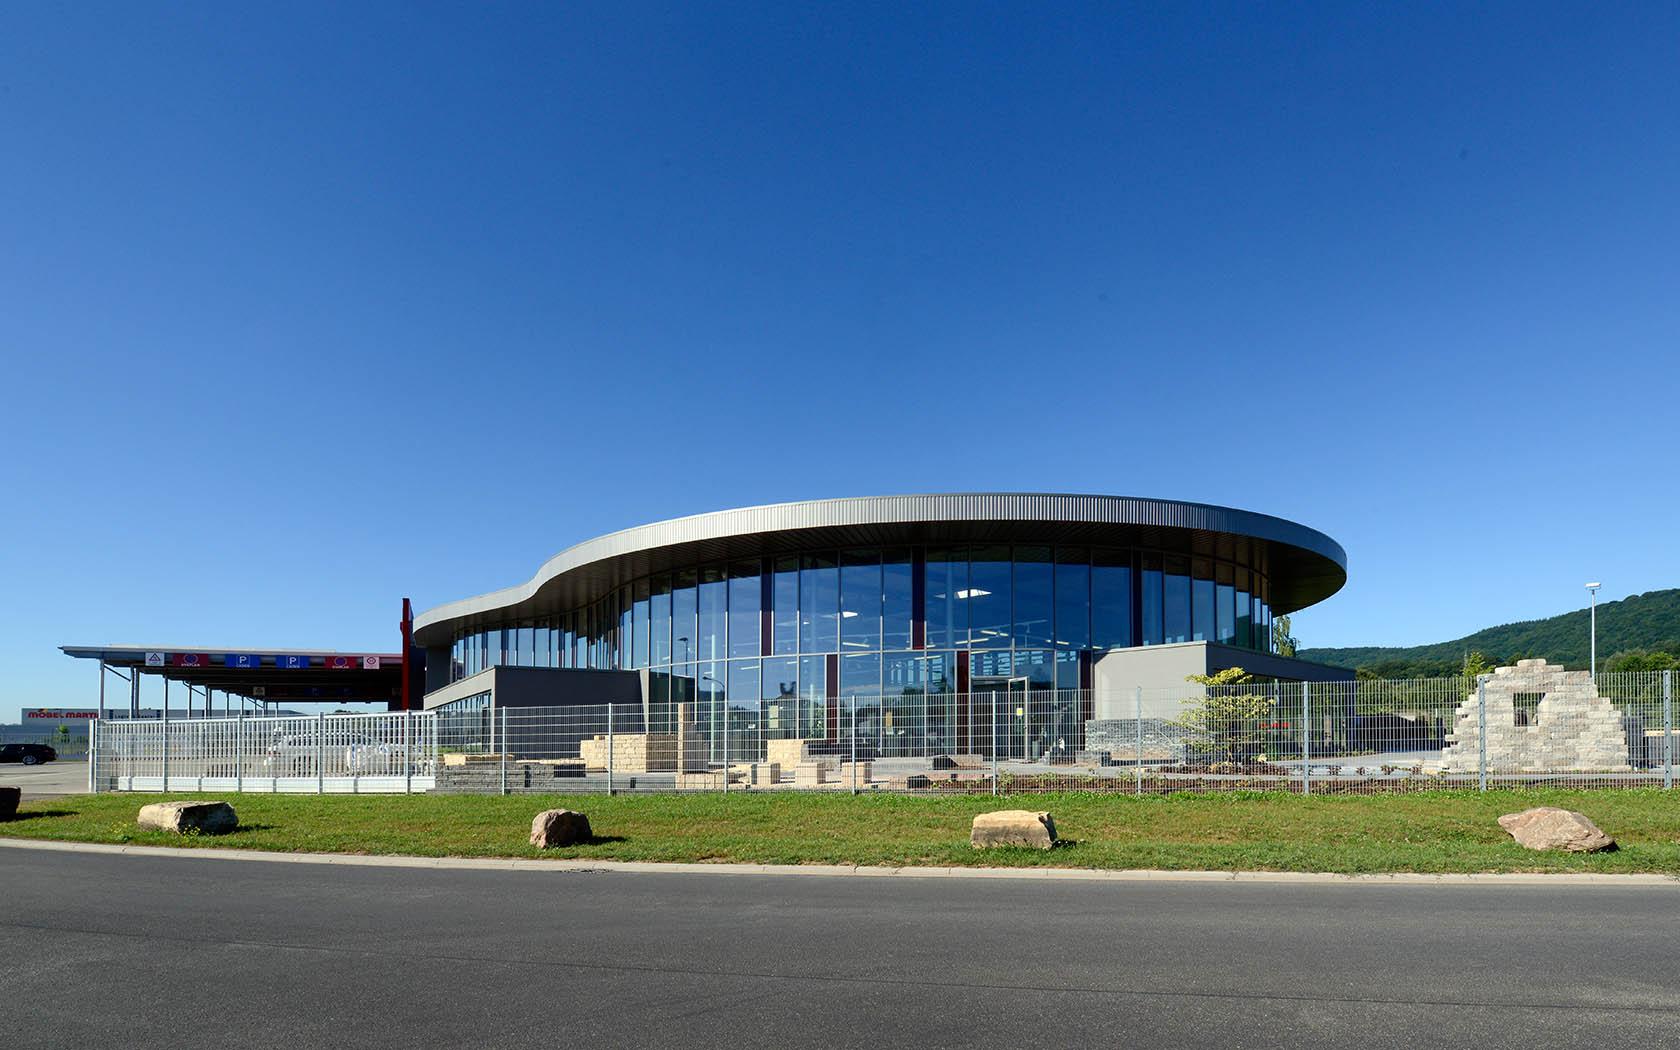 BBK Baucentrum, Konz